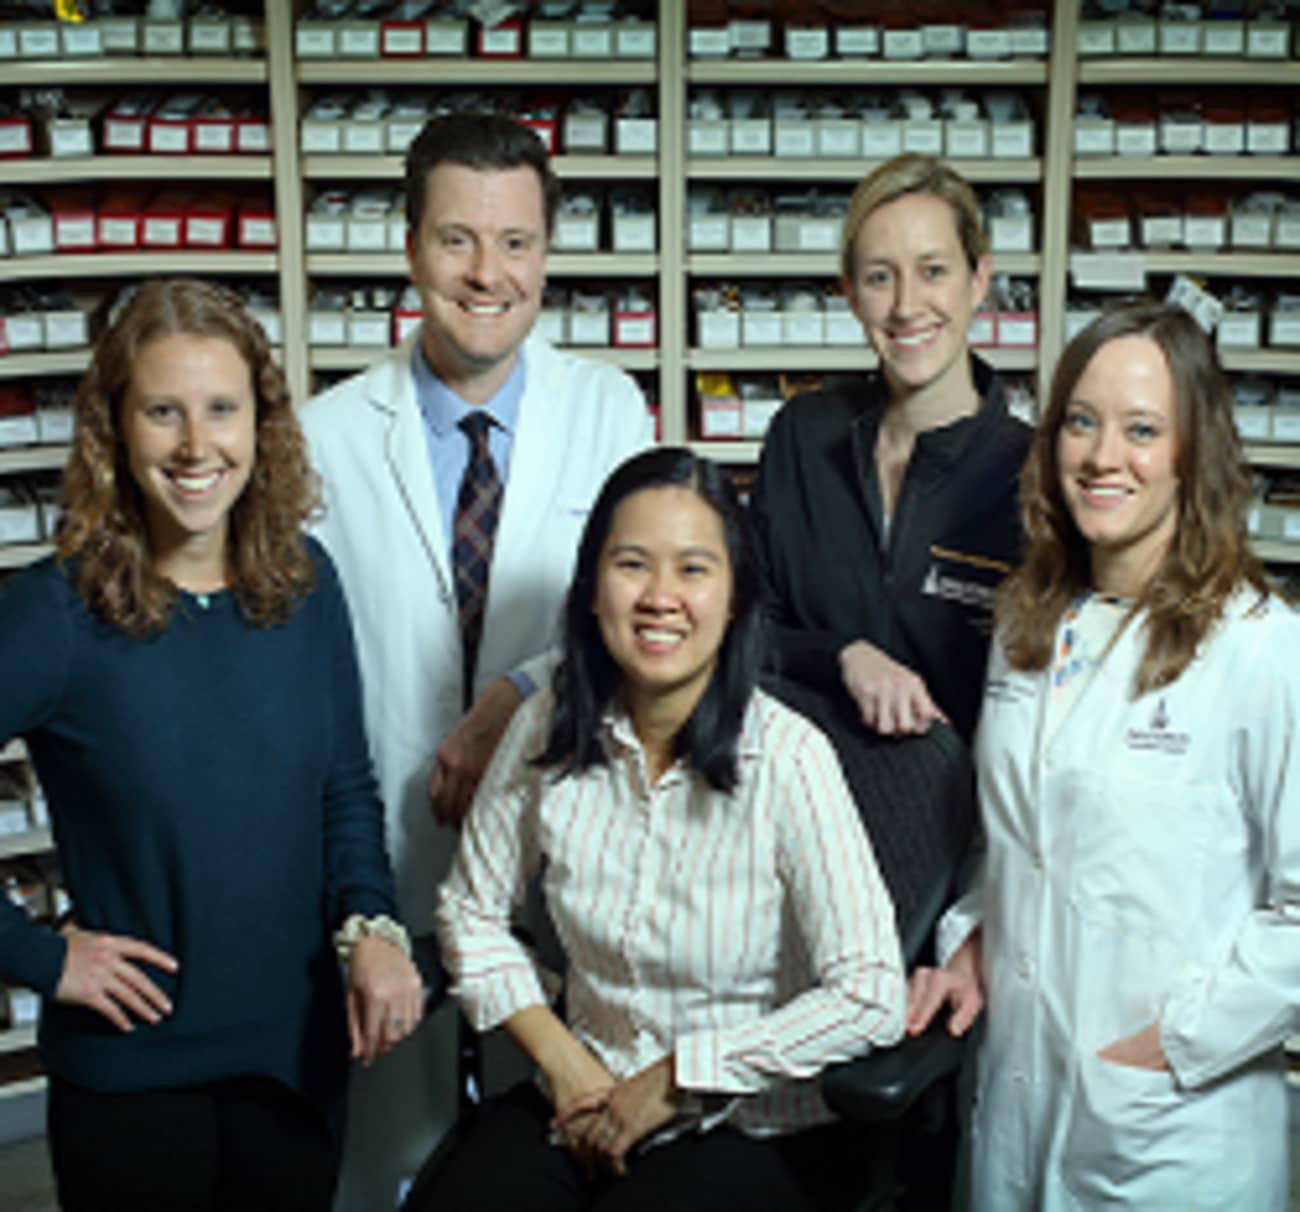 NINJA Wages War Against Kidney Disease - Johns Hopkins Medicine